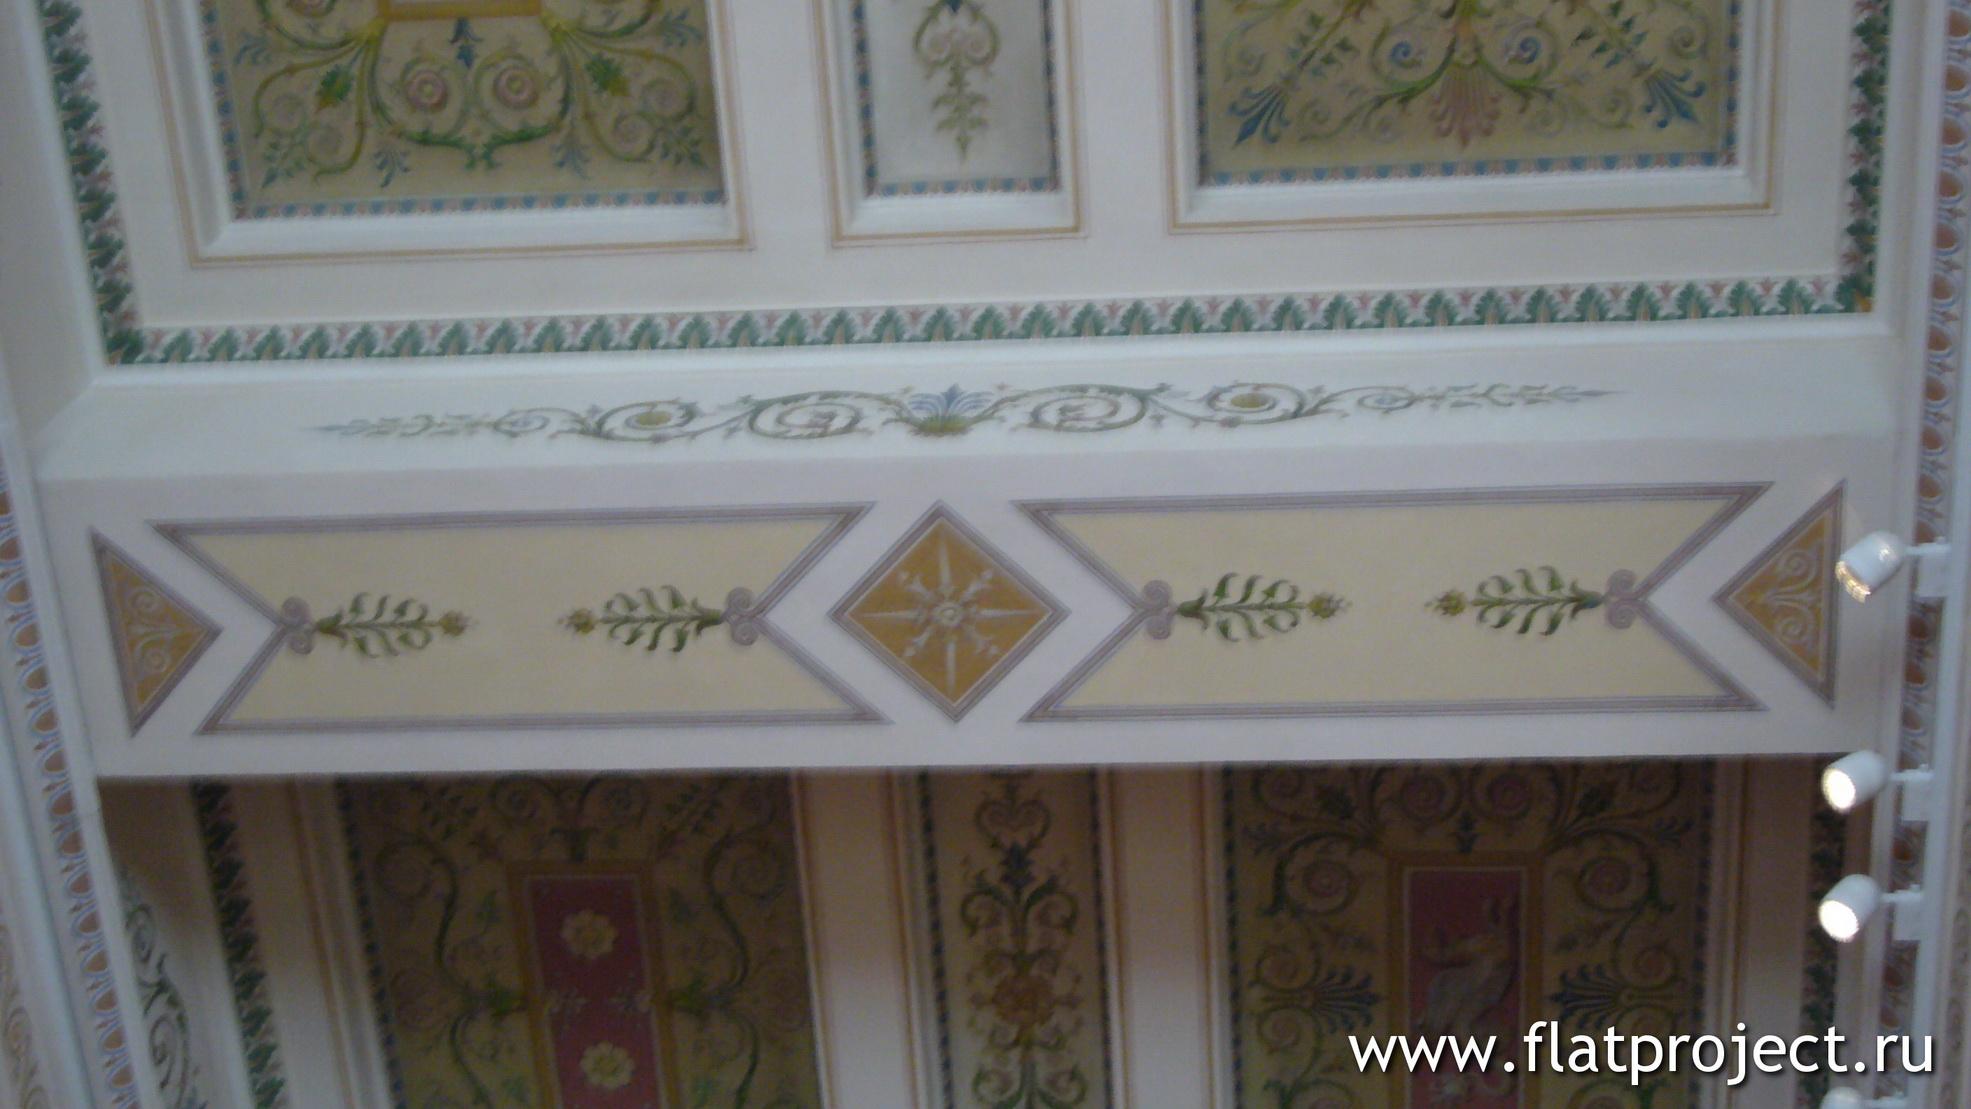 The State Hermitage museum interiors – photo 269